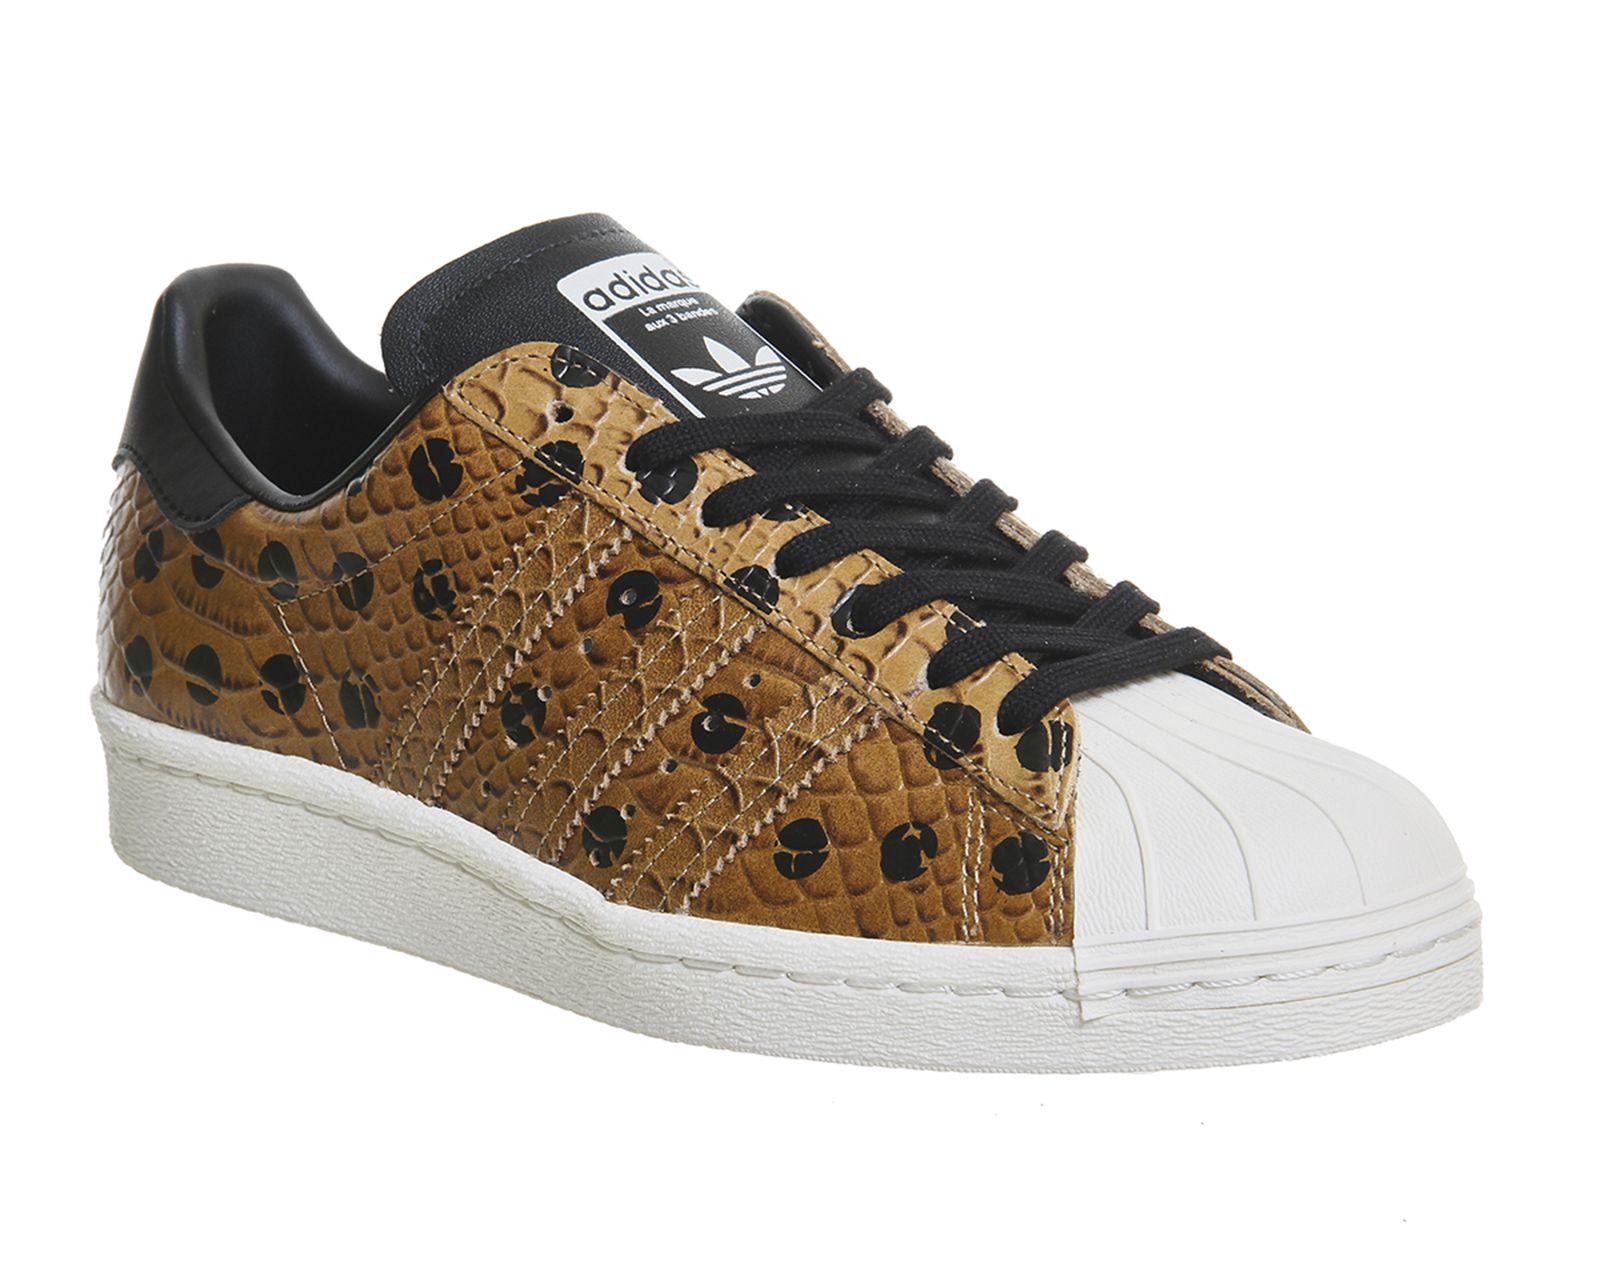 Adidas Sneakers Superstar 80s Snake Polka Dot